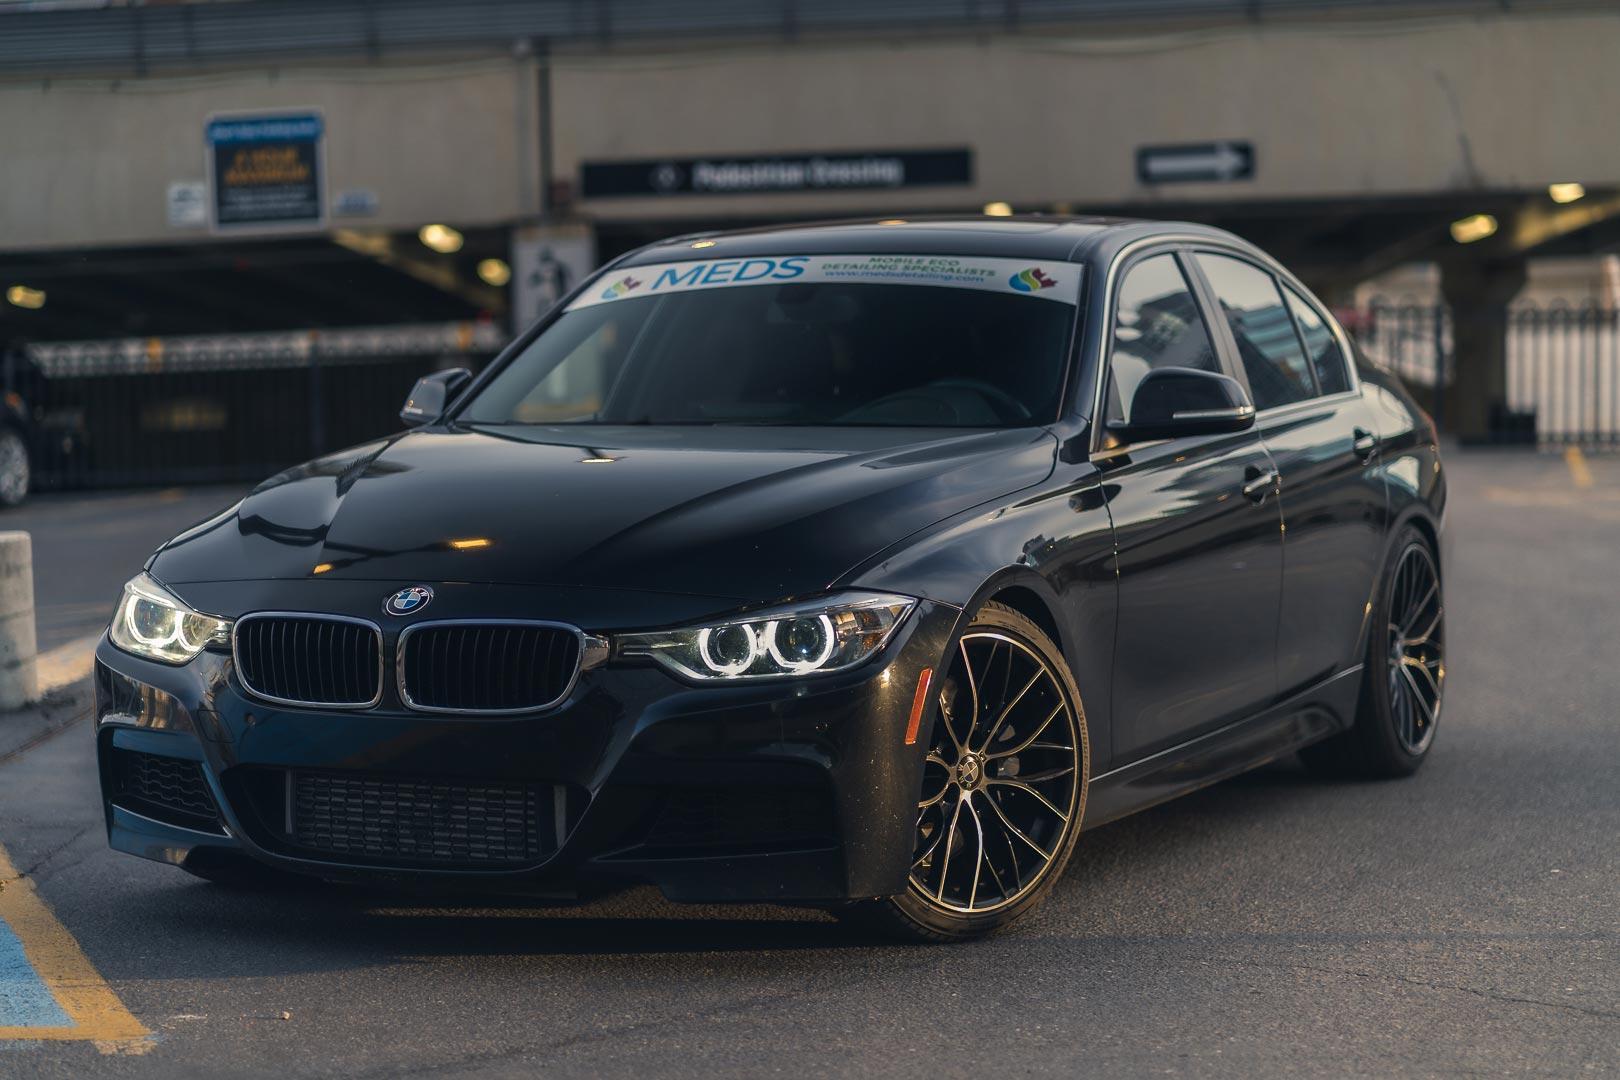 Detailed BMW with Meds detailing banner